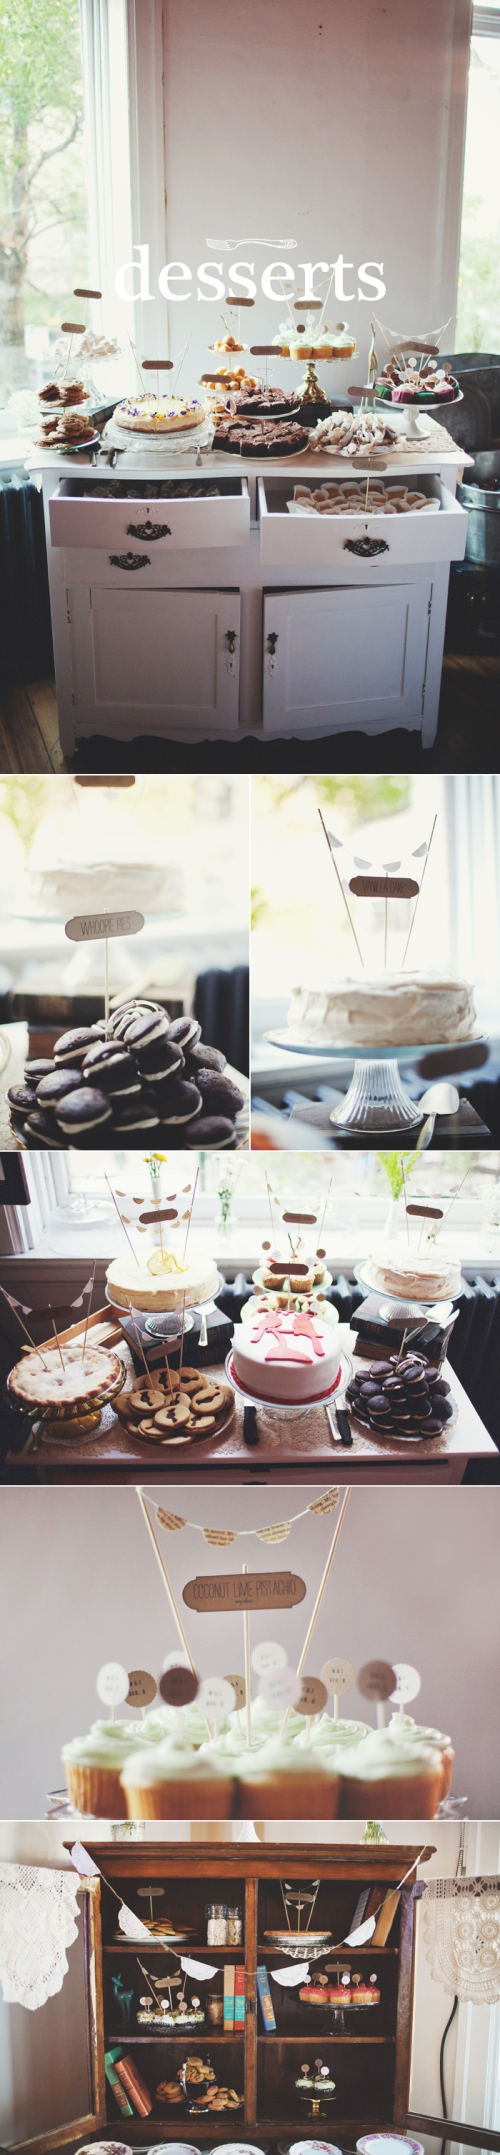 mysuitcaseheart_cupcakes